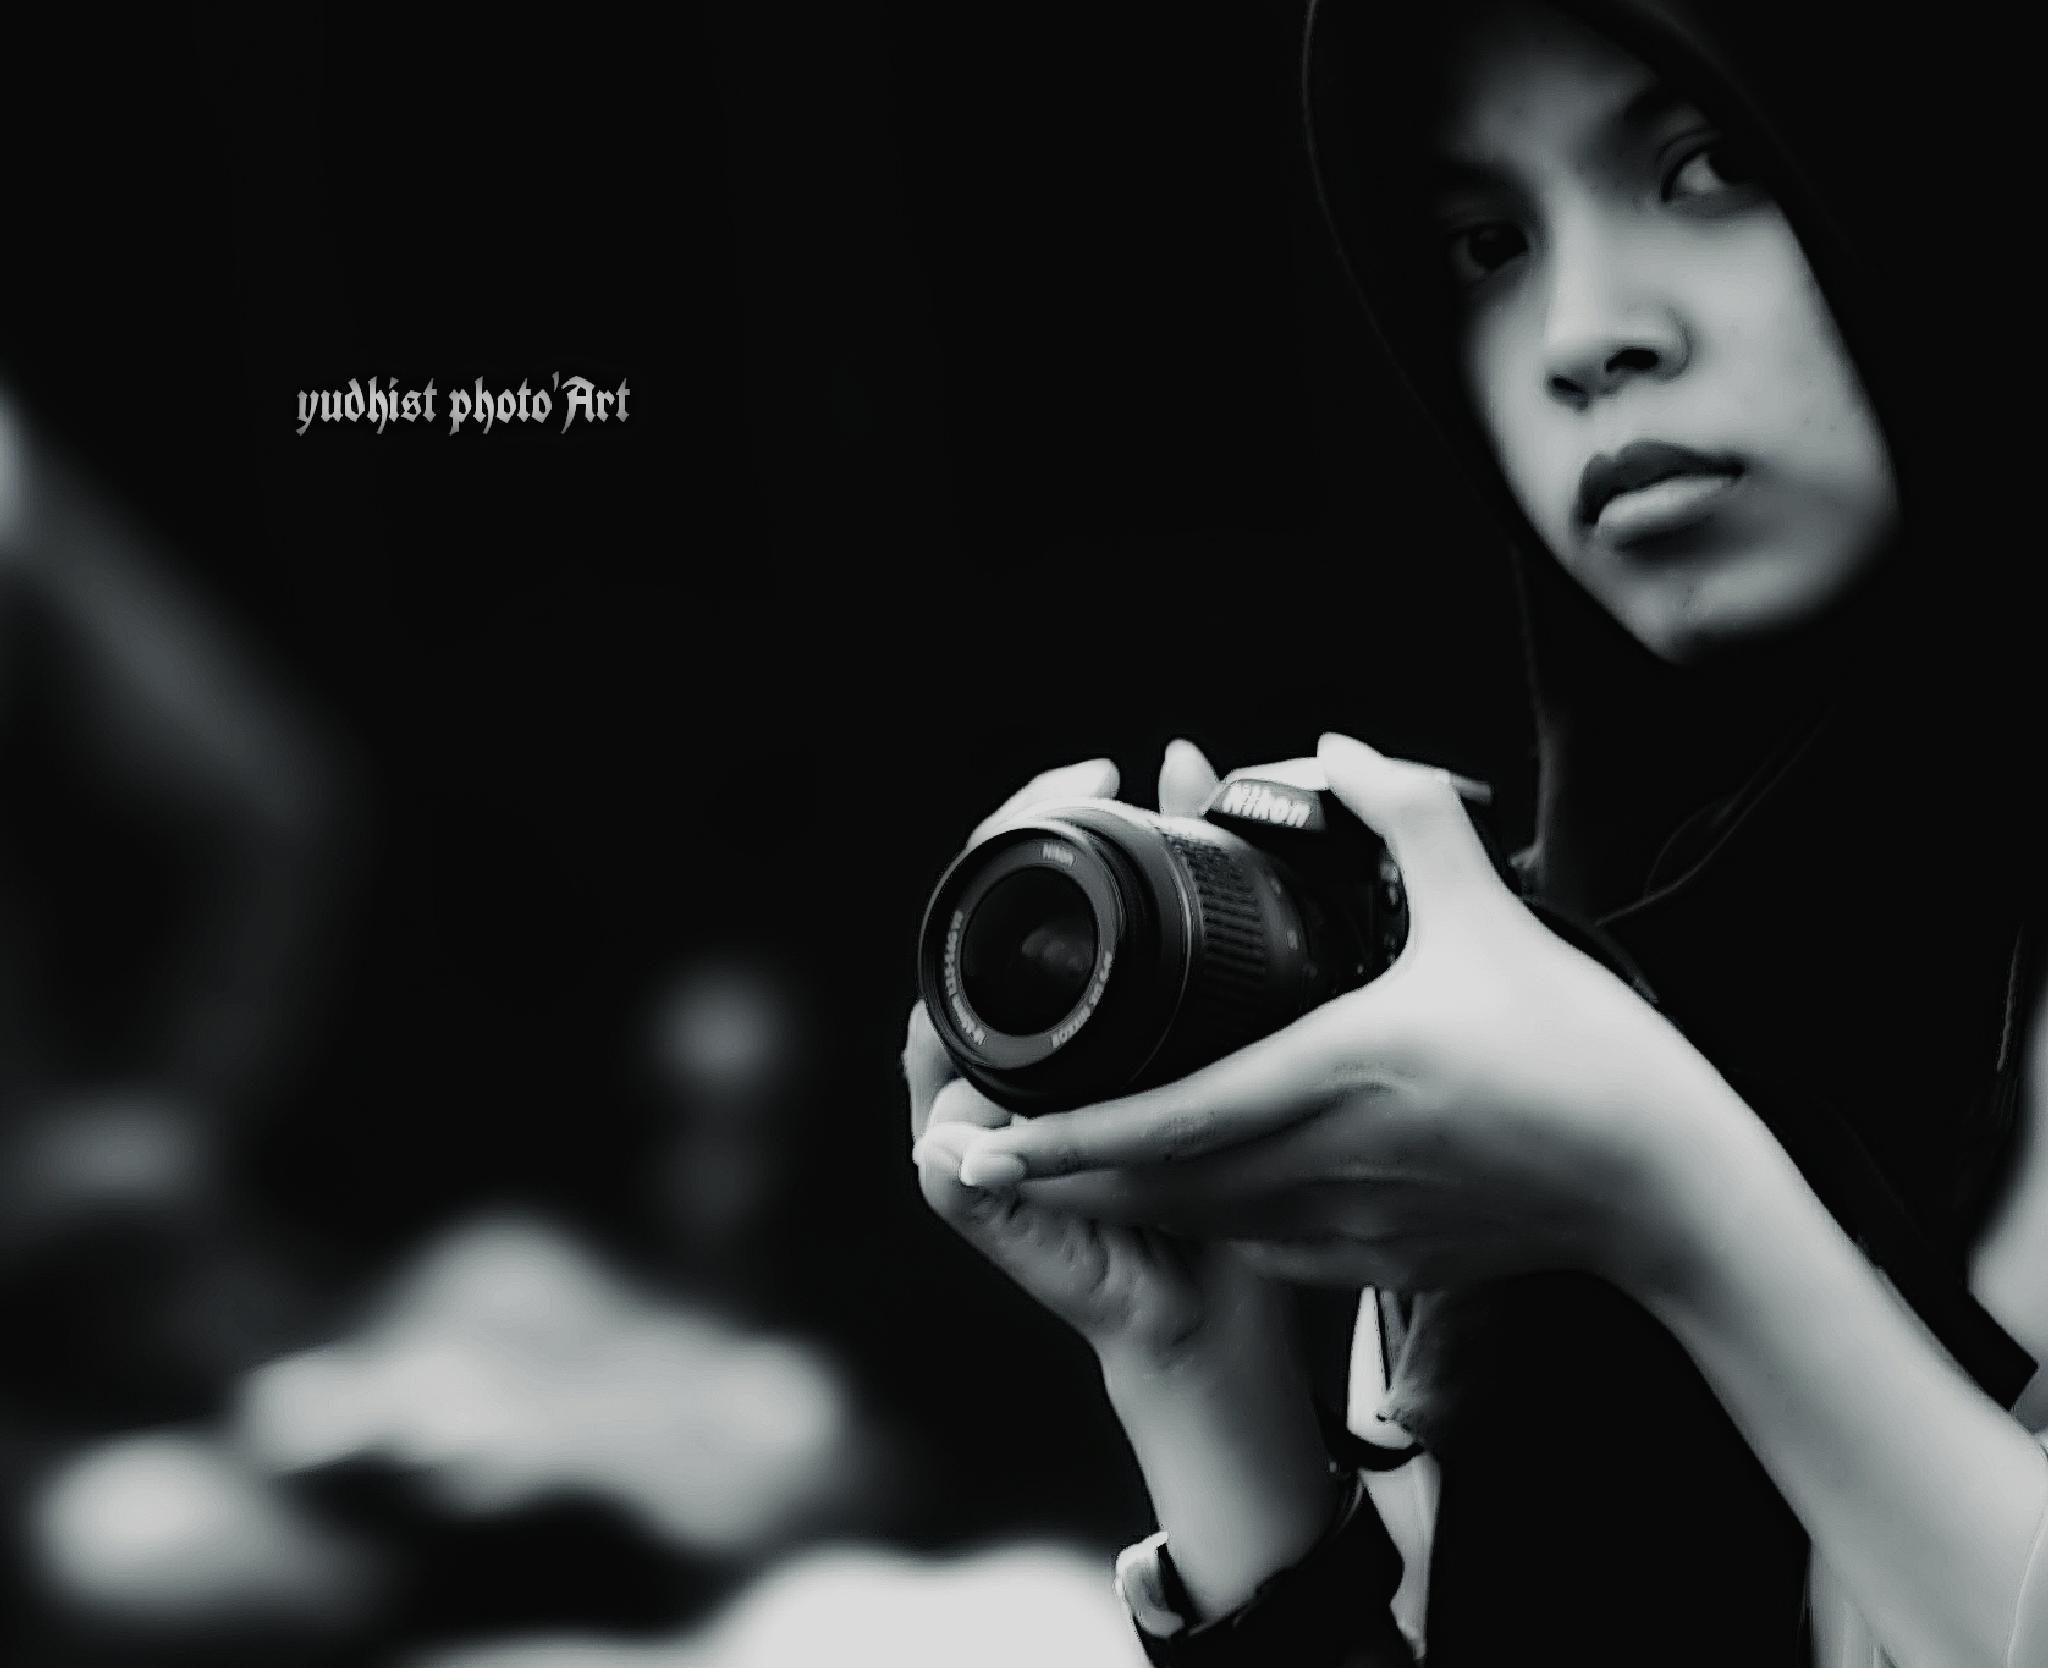 woman n camera by yudhistwira